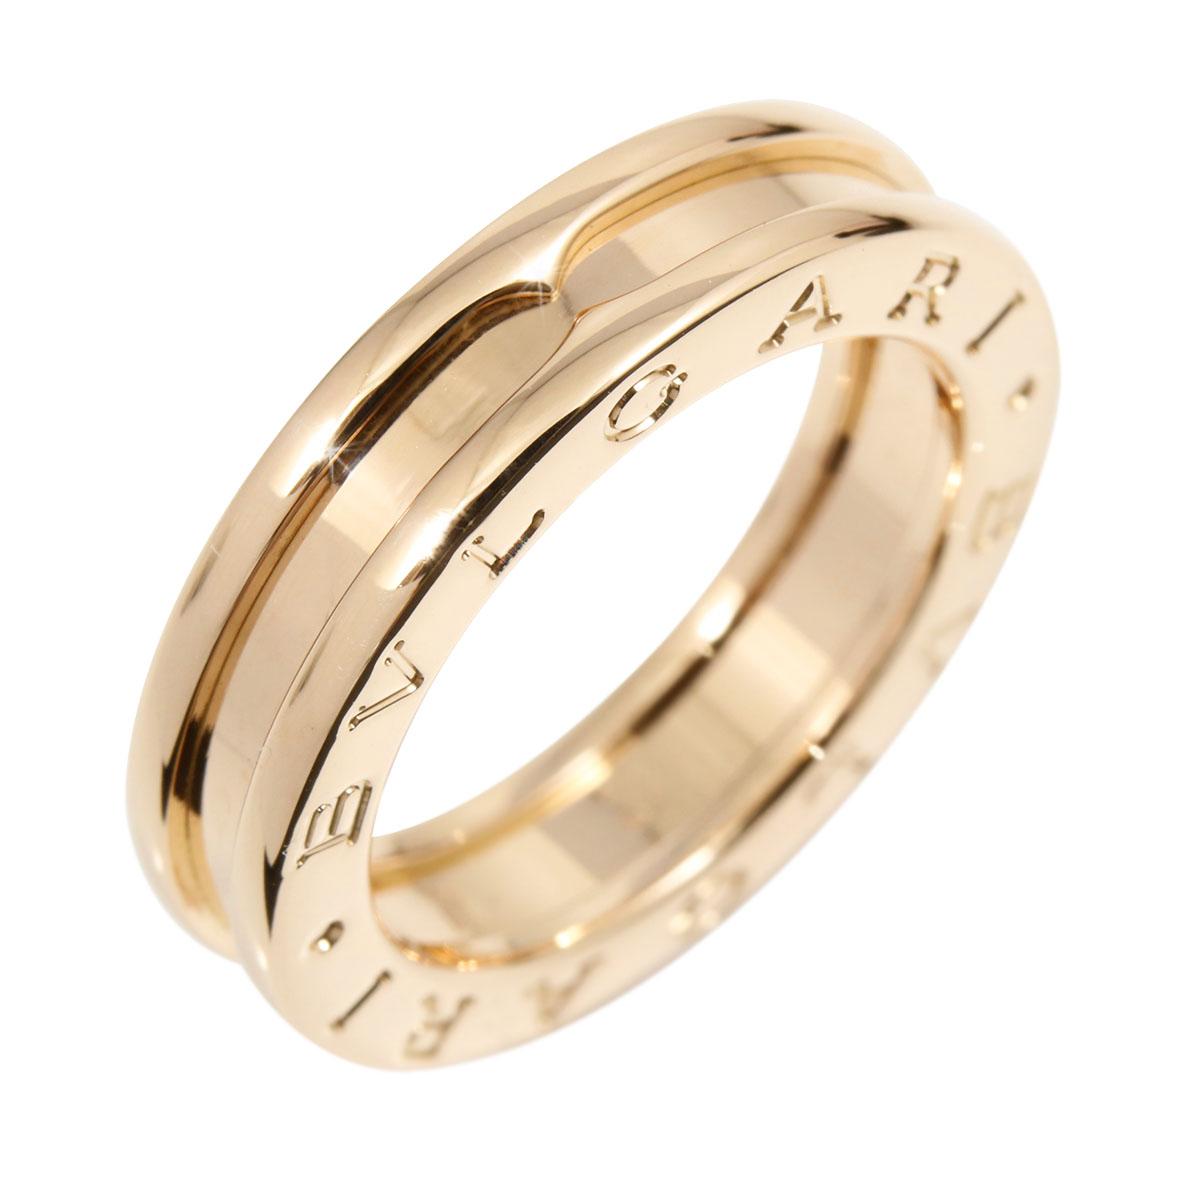 18e9ba95759 Details about Auth BVLGARI 18K Rose Gold B-Zero 1 XS Band Ring US5.5 EU50  A1653